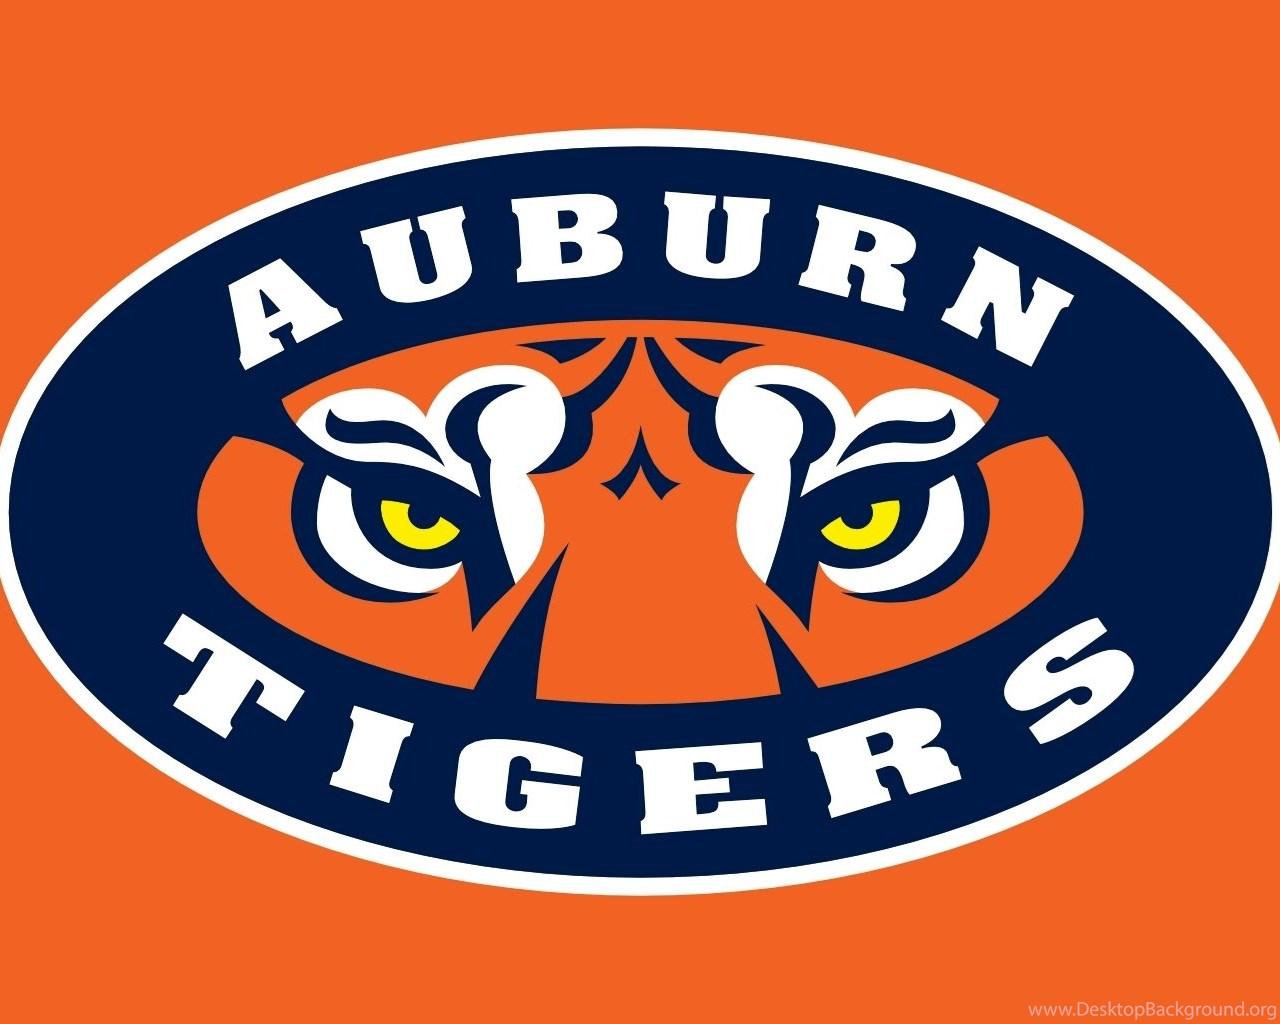 972540 auburn wallpapers desktop background rh desktopbackground org Auburn Tigers Football Logo Auburn University Logo